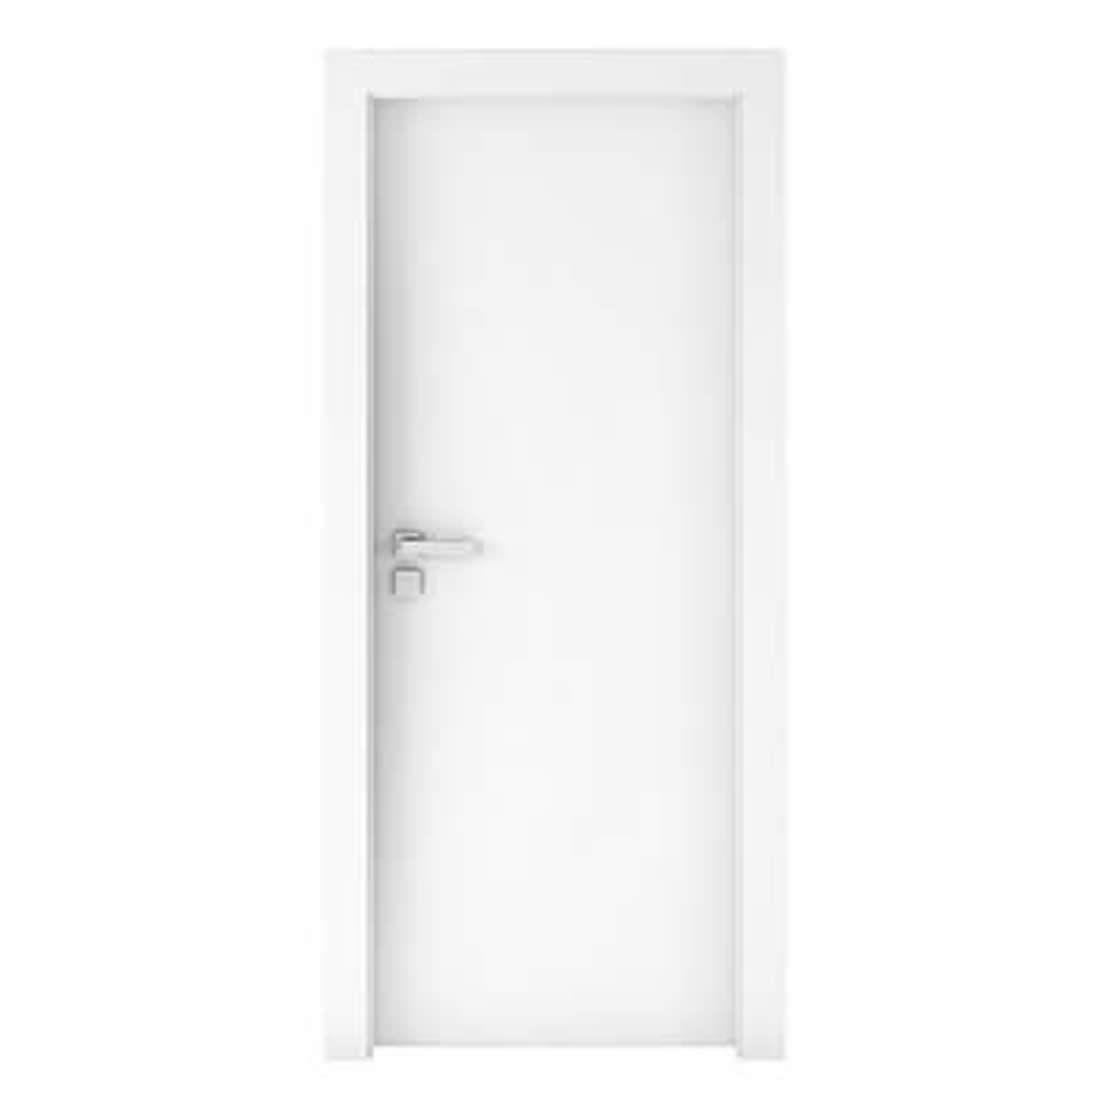 Kit Porta Concrem Wood 2,10 x 0,80 x 3,5 cm Direita Branca